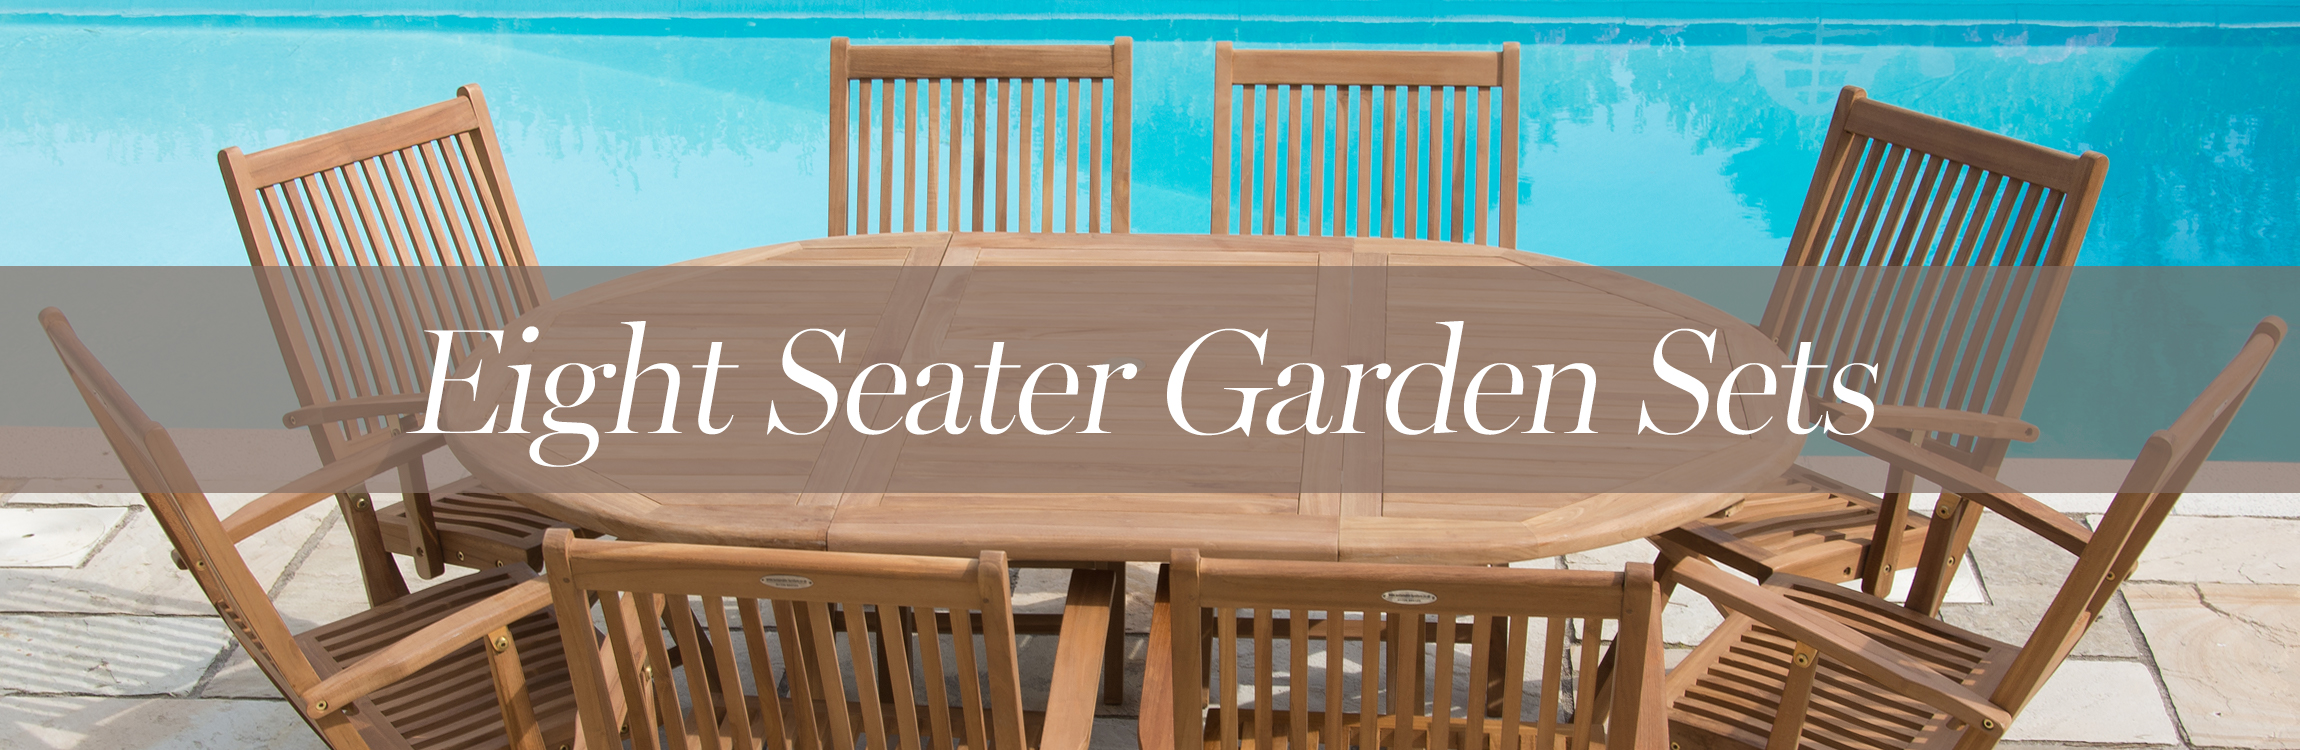 Eight Seater Garden Furniture Sets